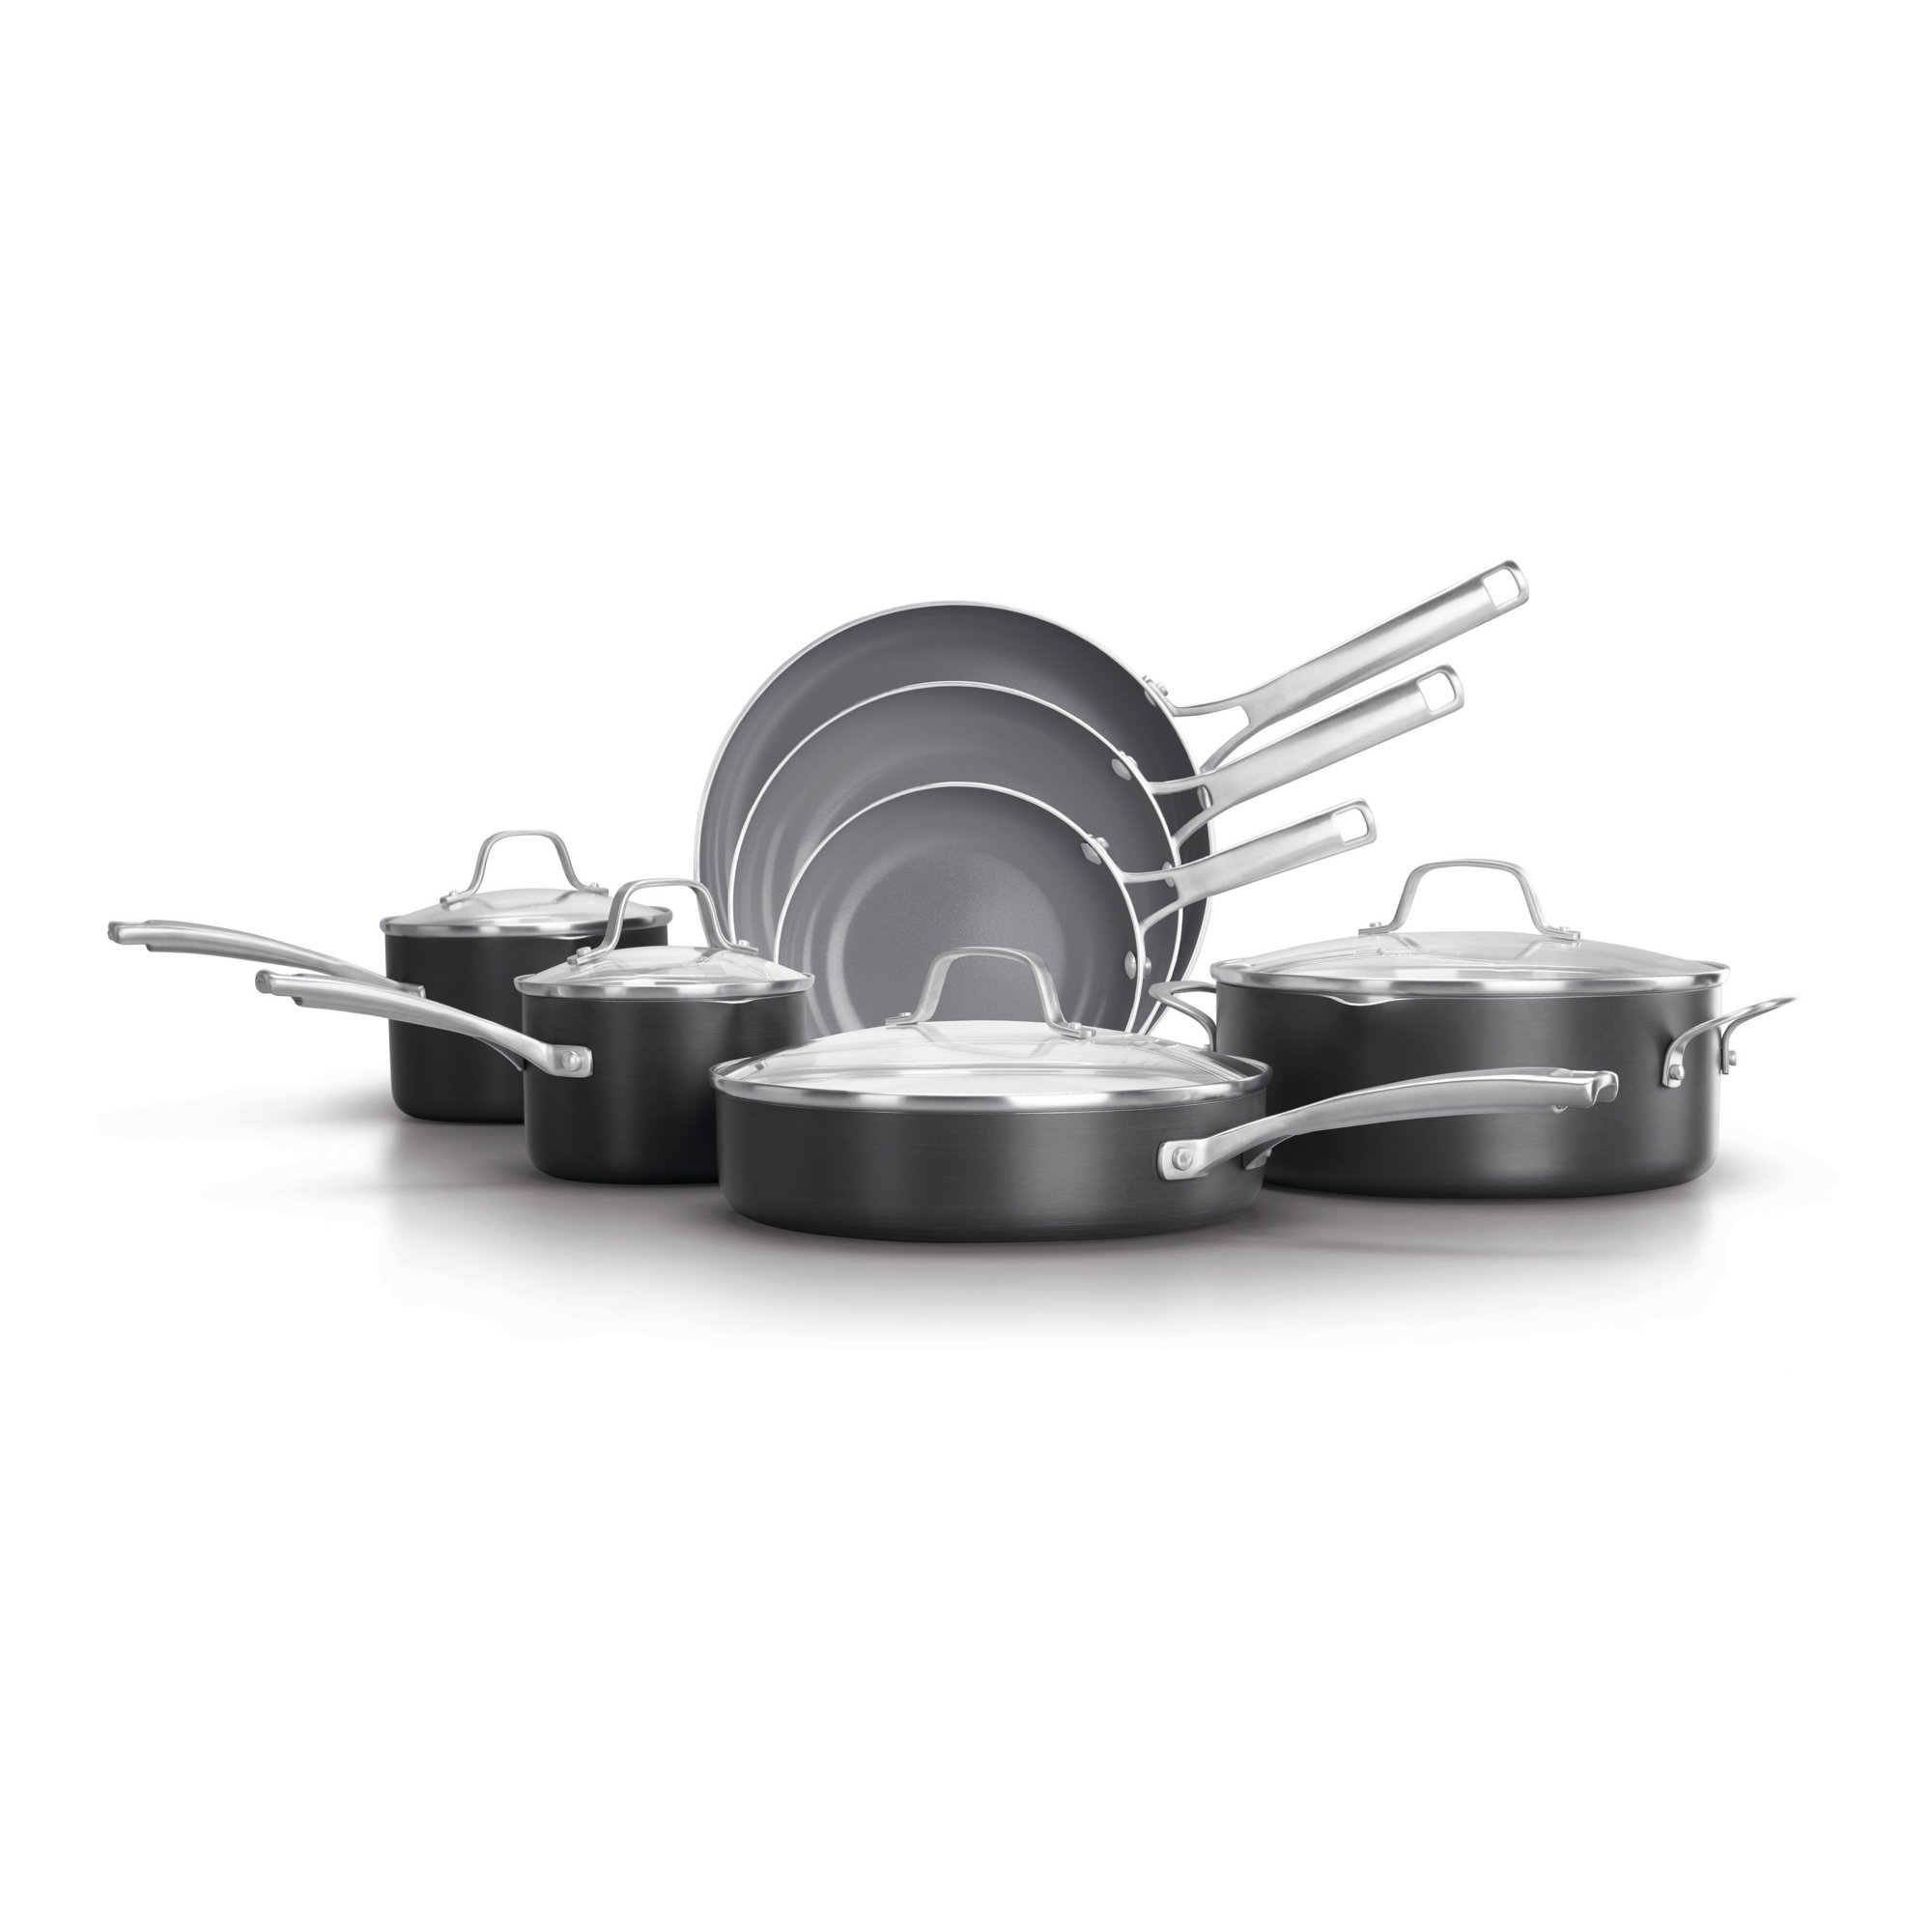 Calphalon Classic Oil Infused Ceramic 11- Piece Cookware Set